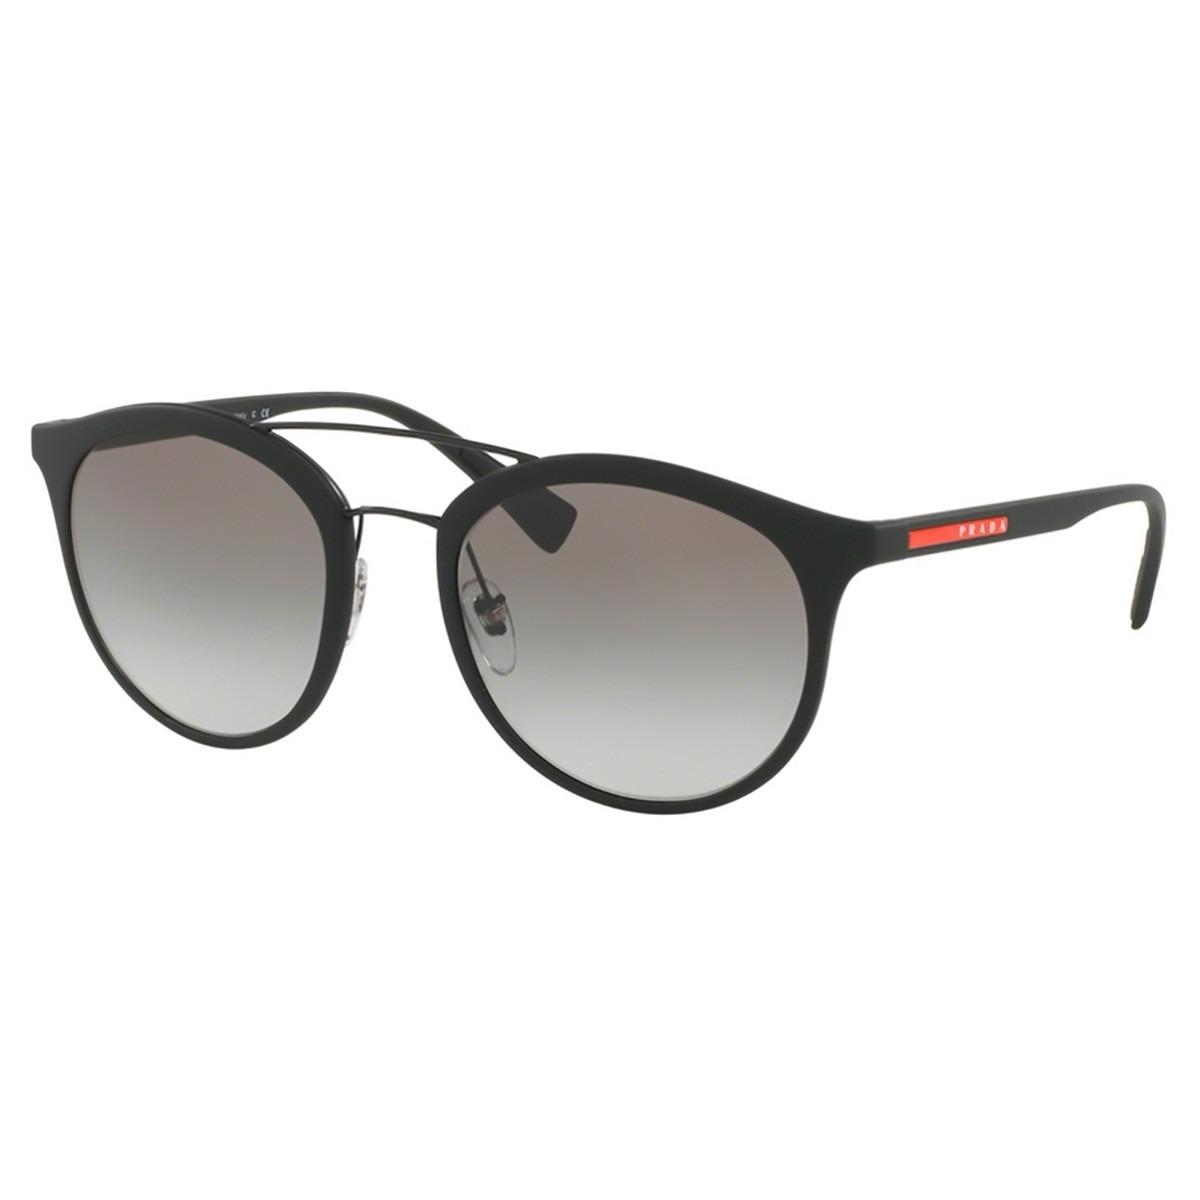 8f8efcdee1cd8 Óculos De Sol Prada Sport Sps04r Dg0-0a7 - R  938